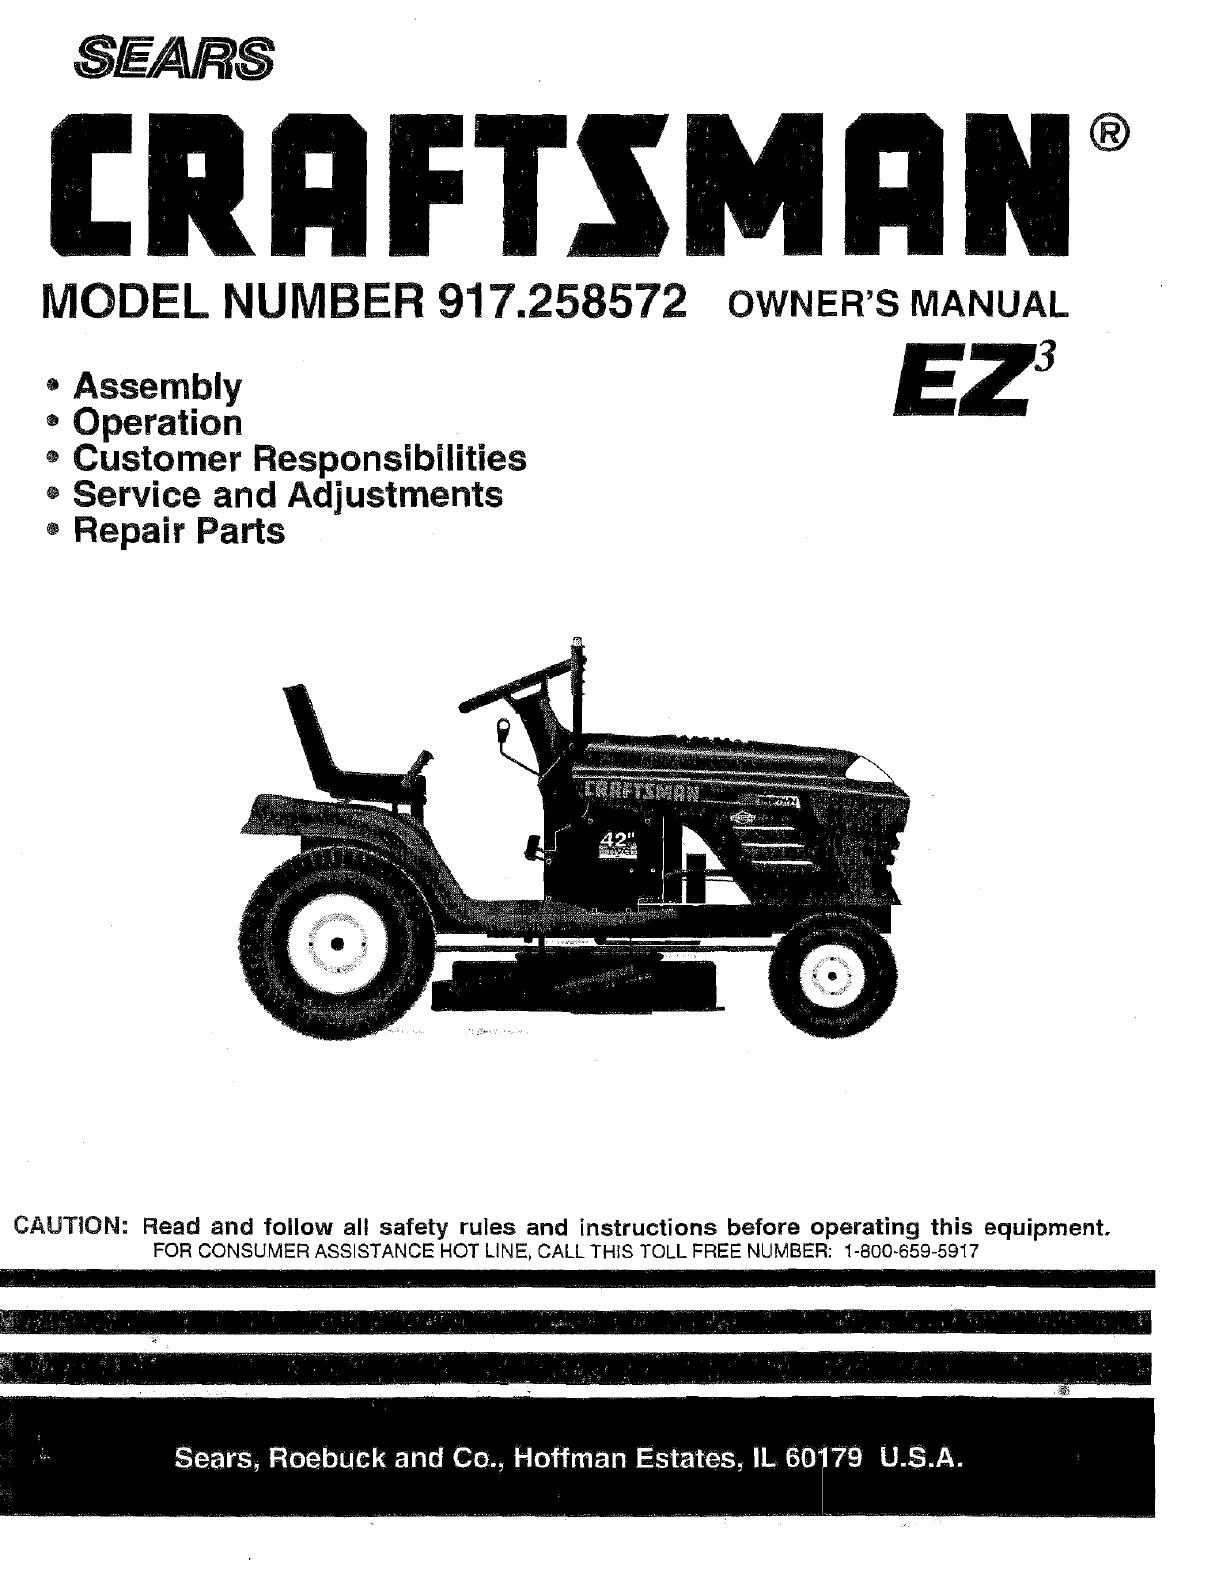 Craftsman Tractor Parts Diagram Craftsman User Manual Tractor Manuals and Guides Of Craftsman Tractor Parts Diagram